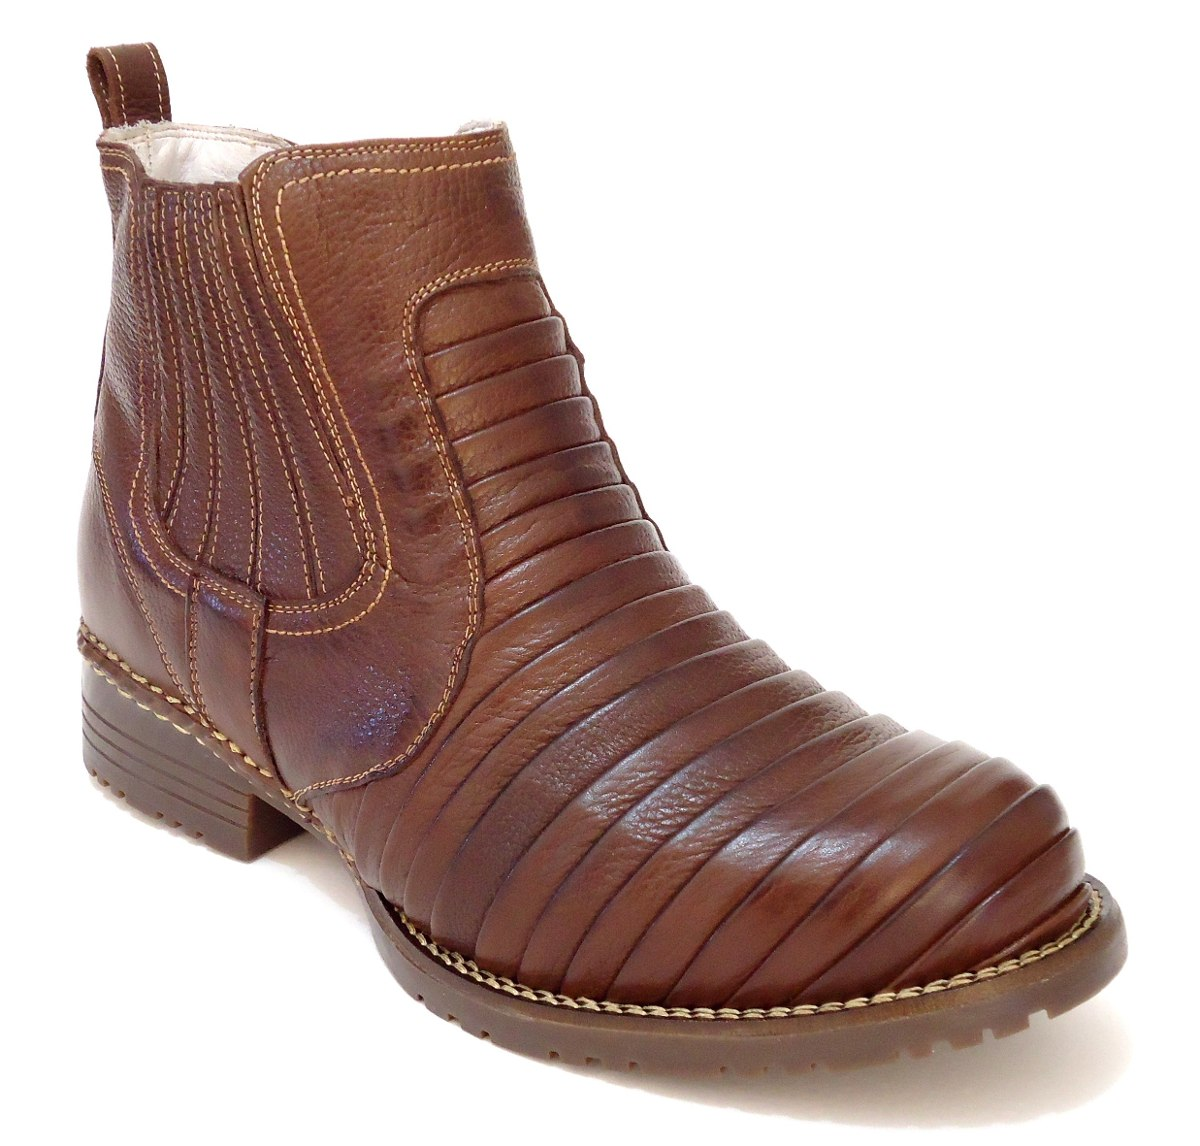 b47335cbff bota de couro escamada country - texana - sapatofranca. Carregando zoom.